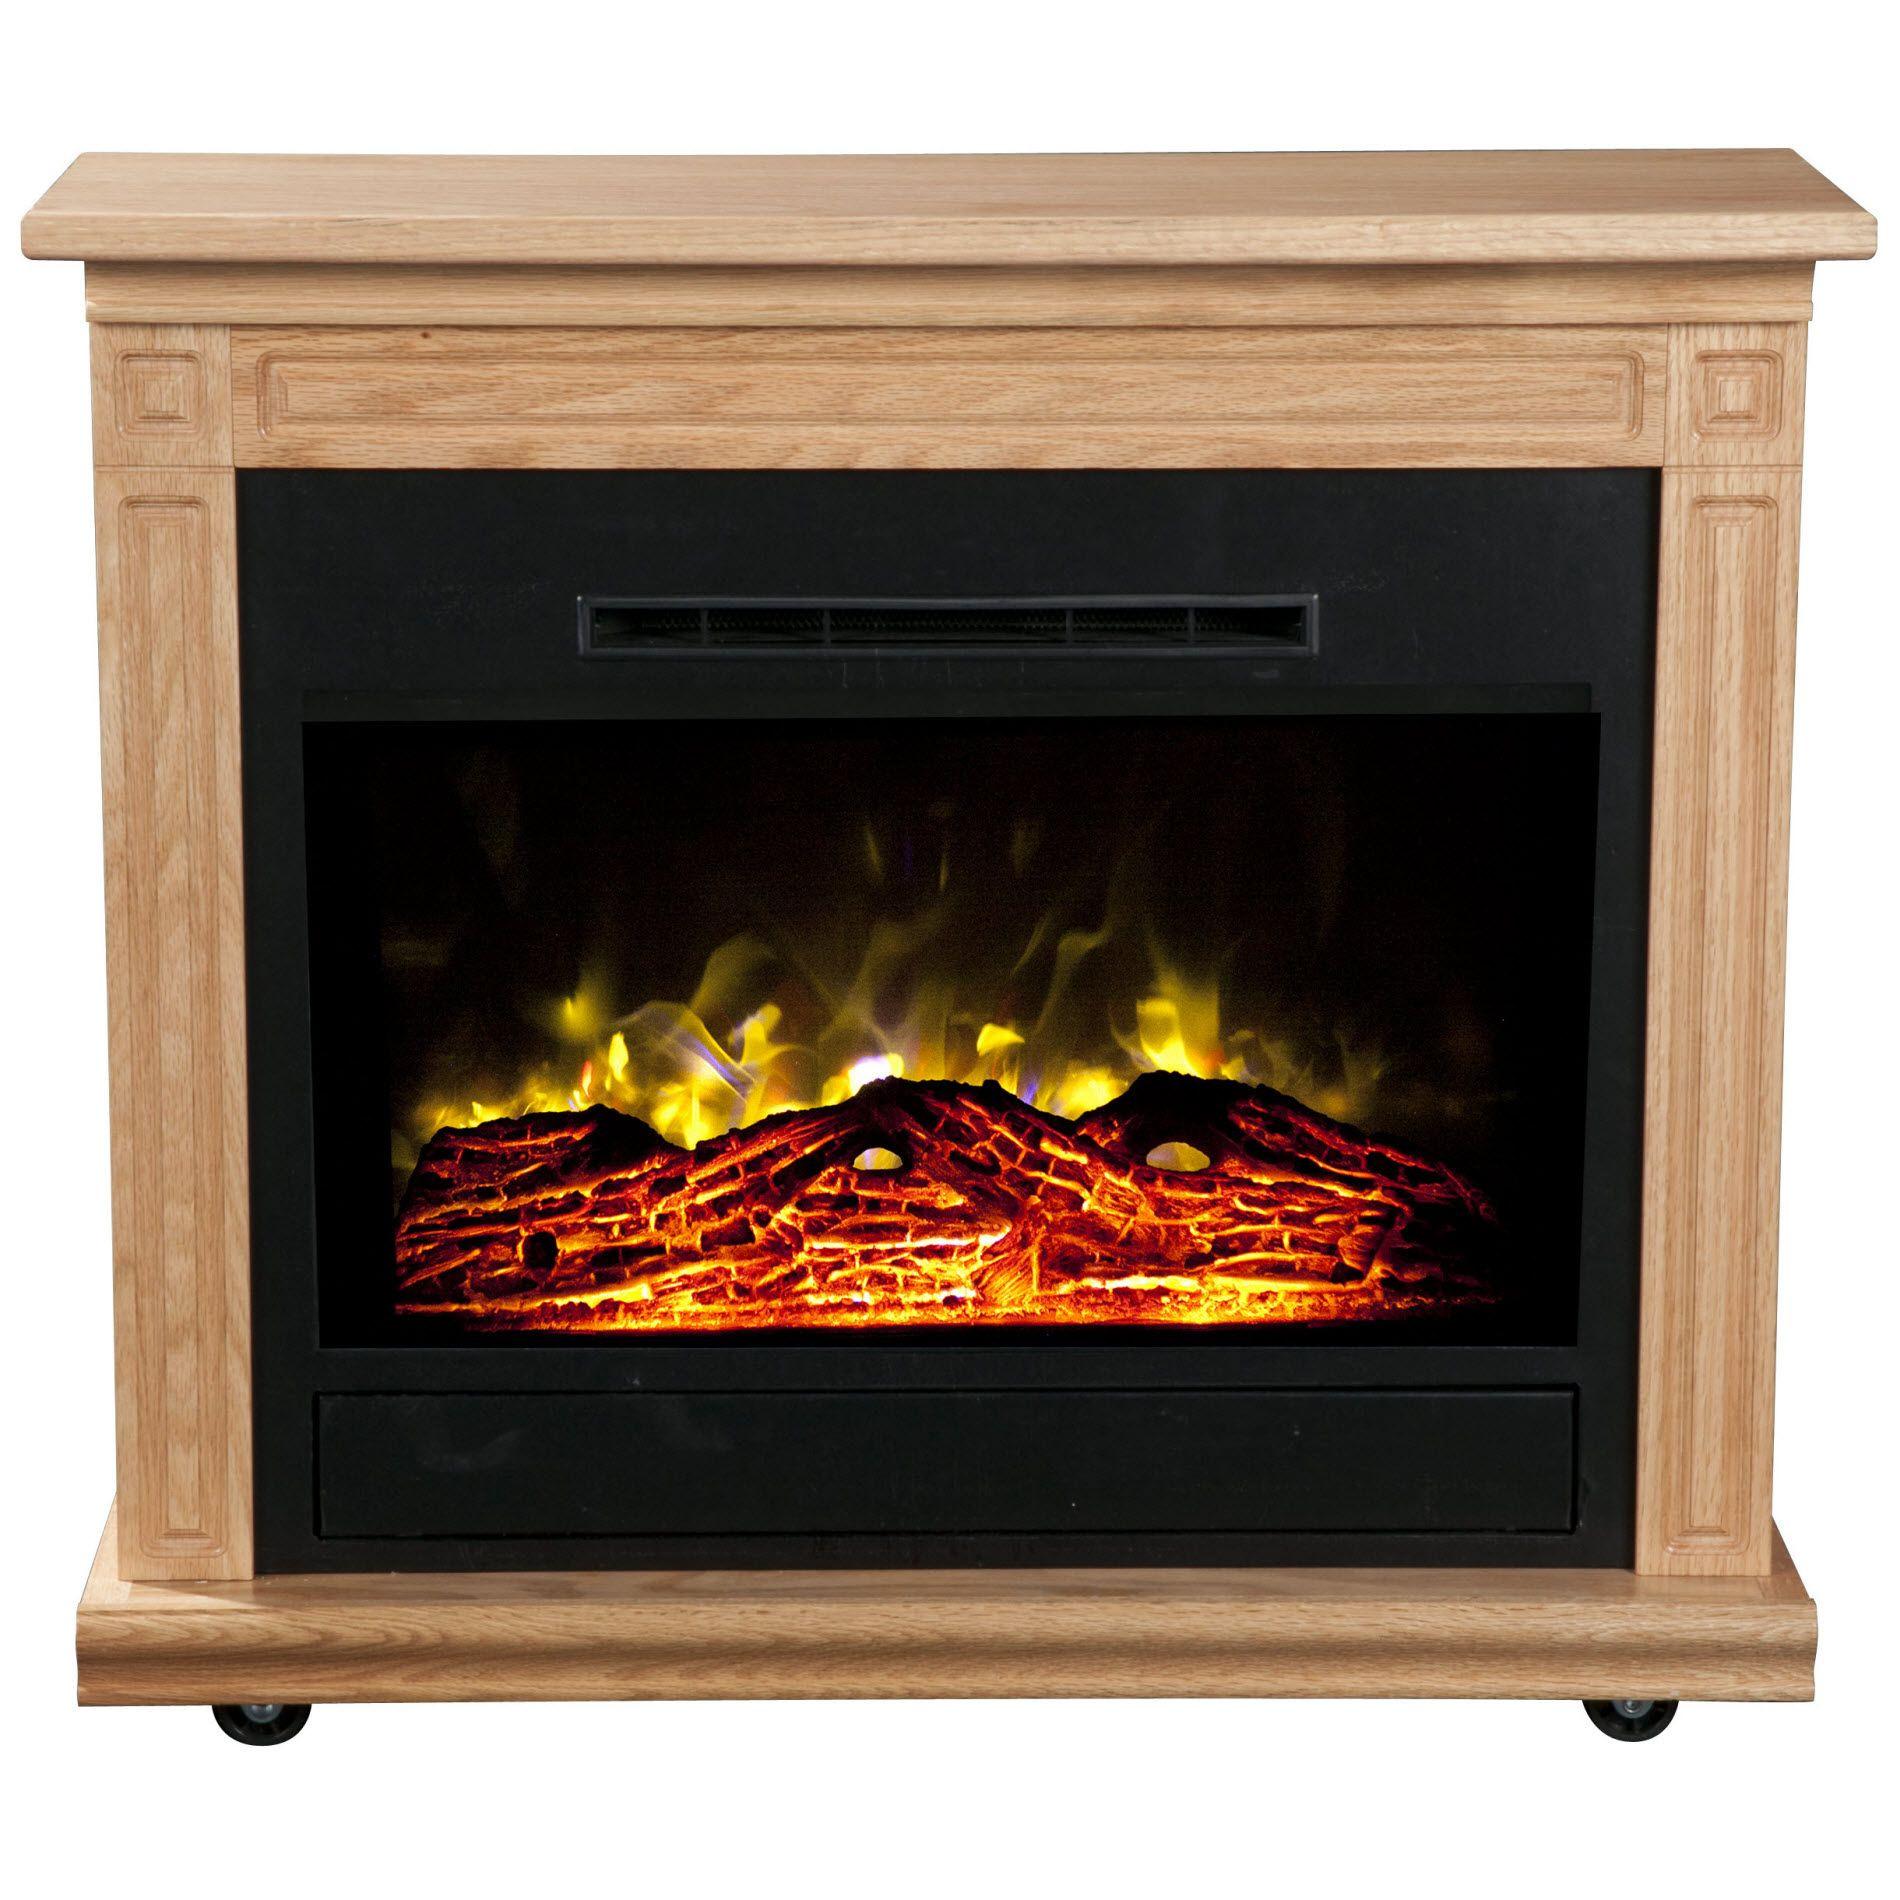 Best ideas about Heat Surge Electric Fireplace . Save or Pin Heat Surge Roll n Glow Electric Fireplace Light Oak Now.